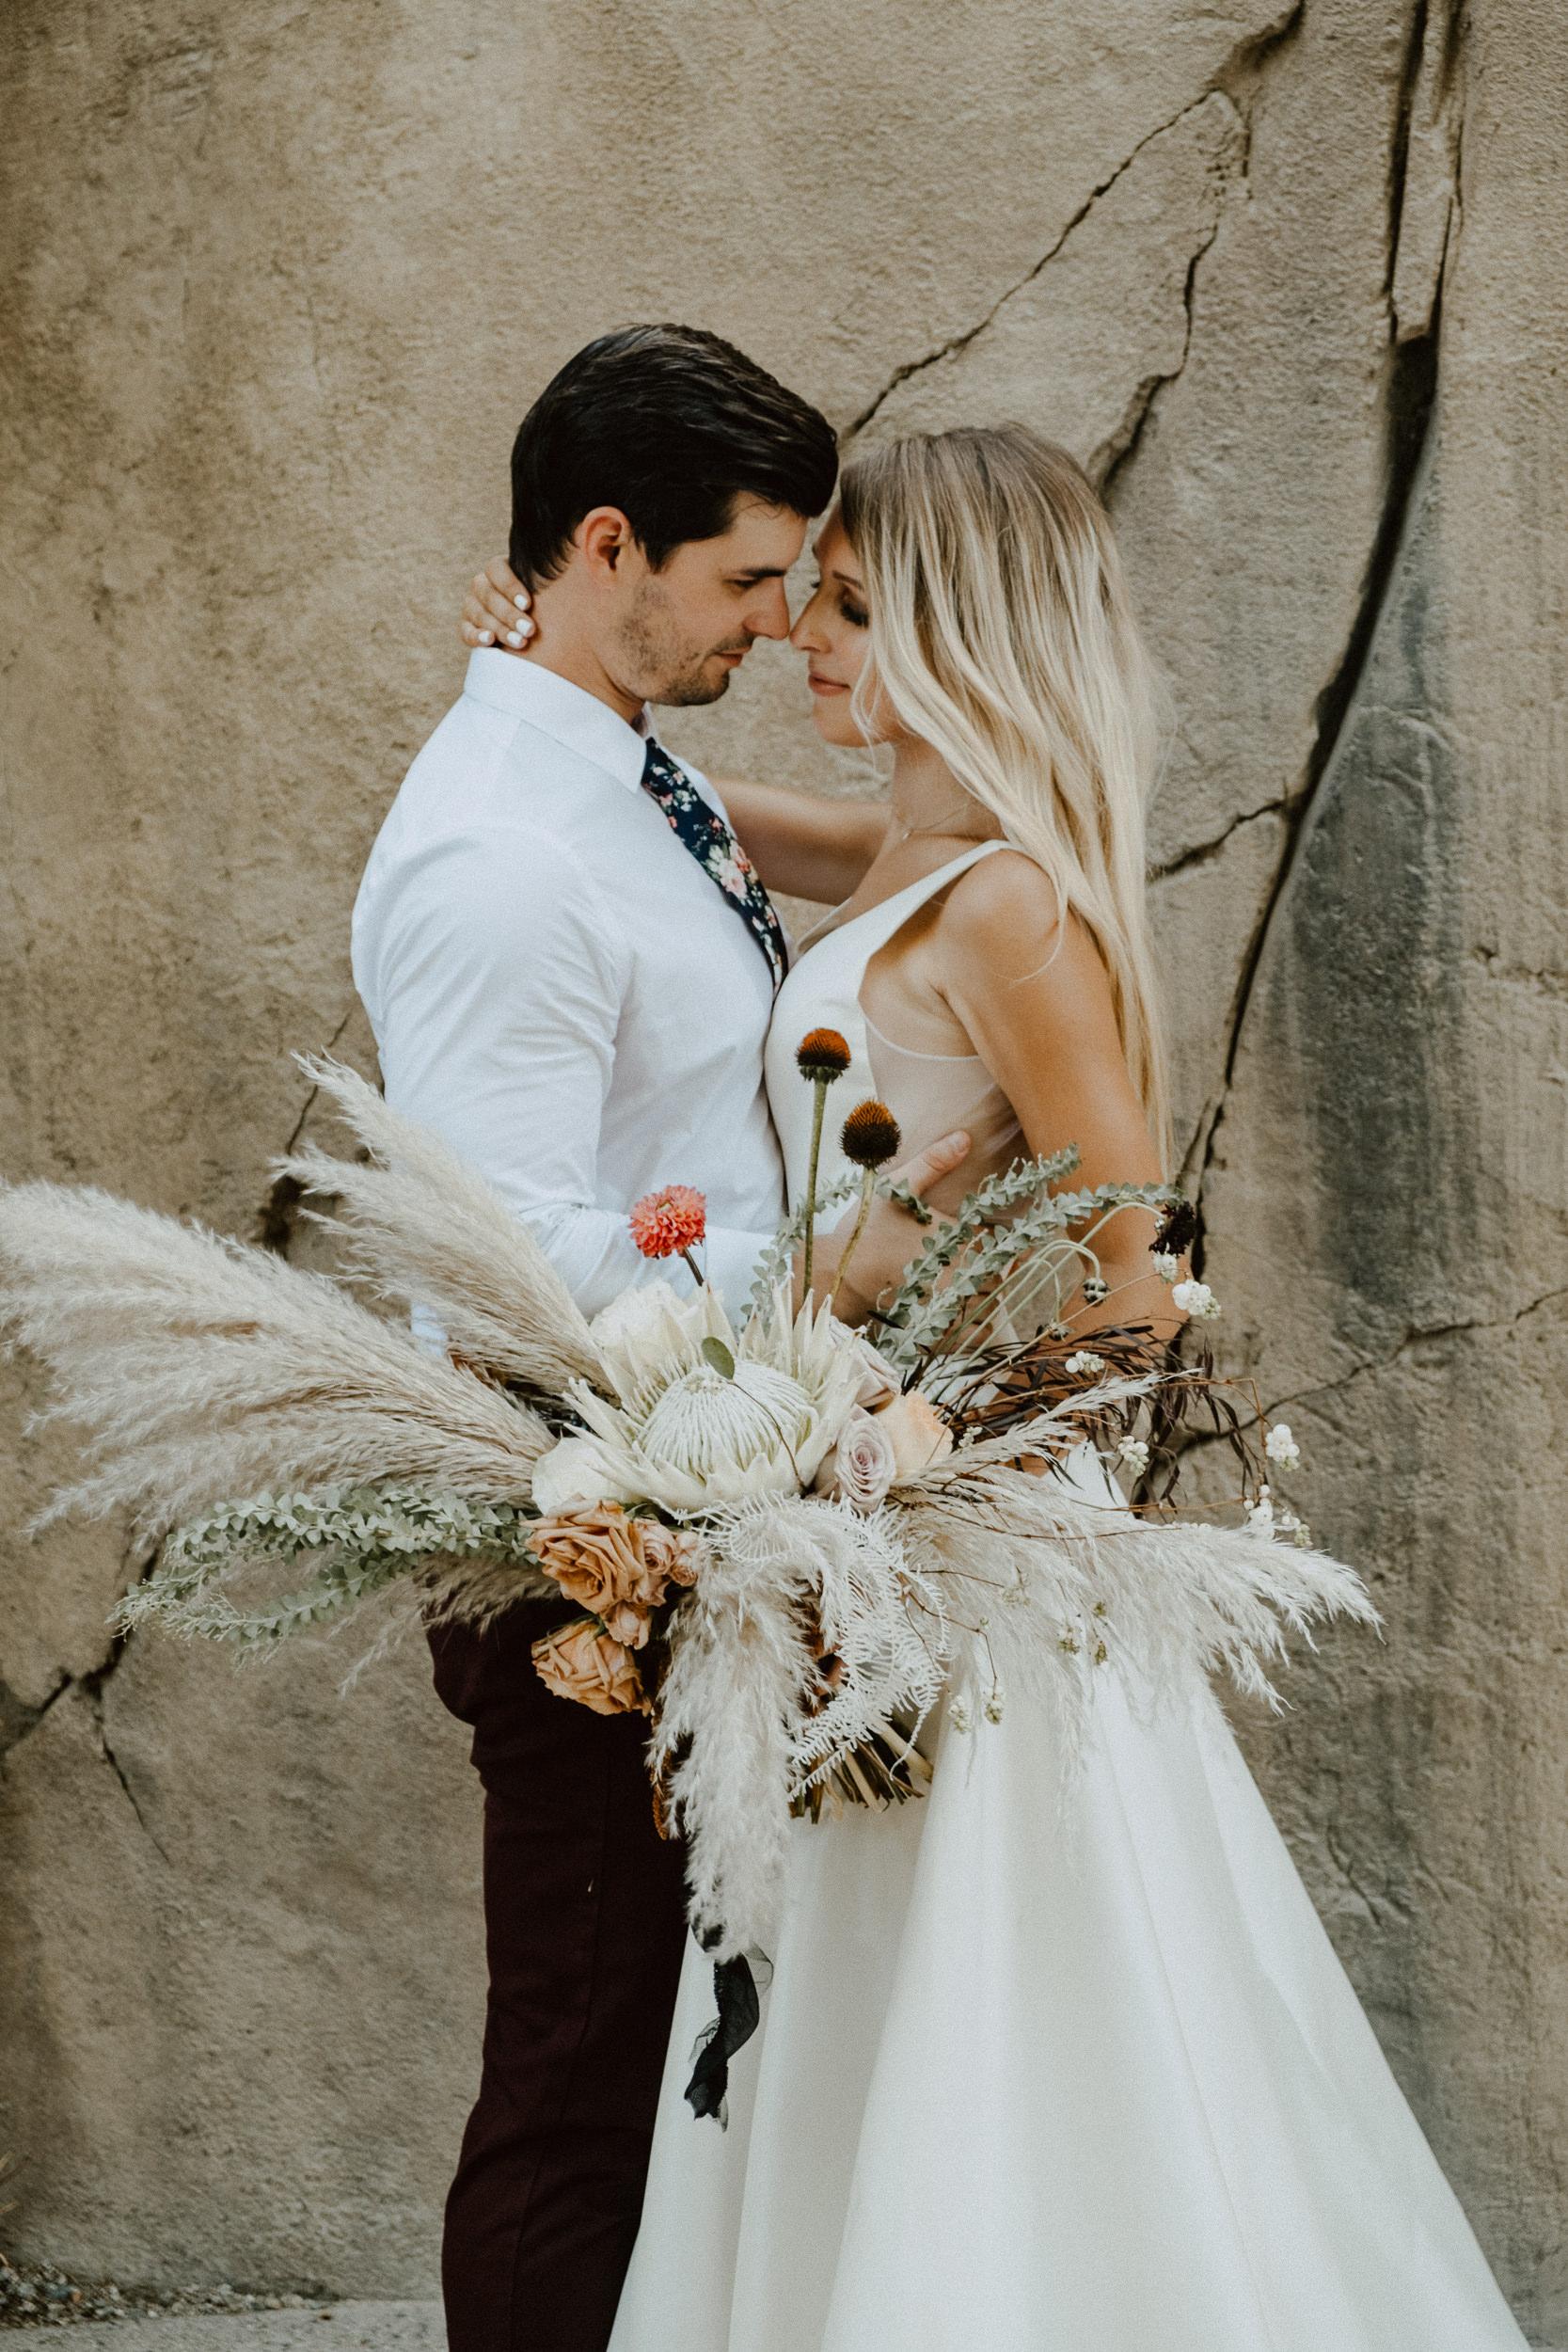 sChelsie + Chris - The Desert Shootout Wedding Romantics at The Living Desert-25.jpg